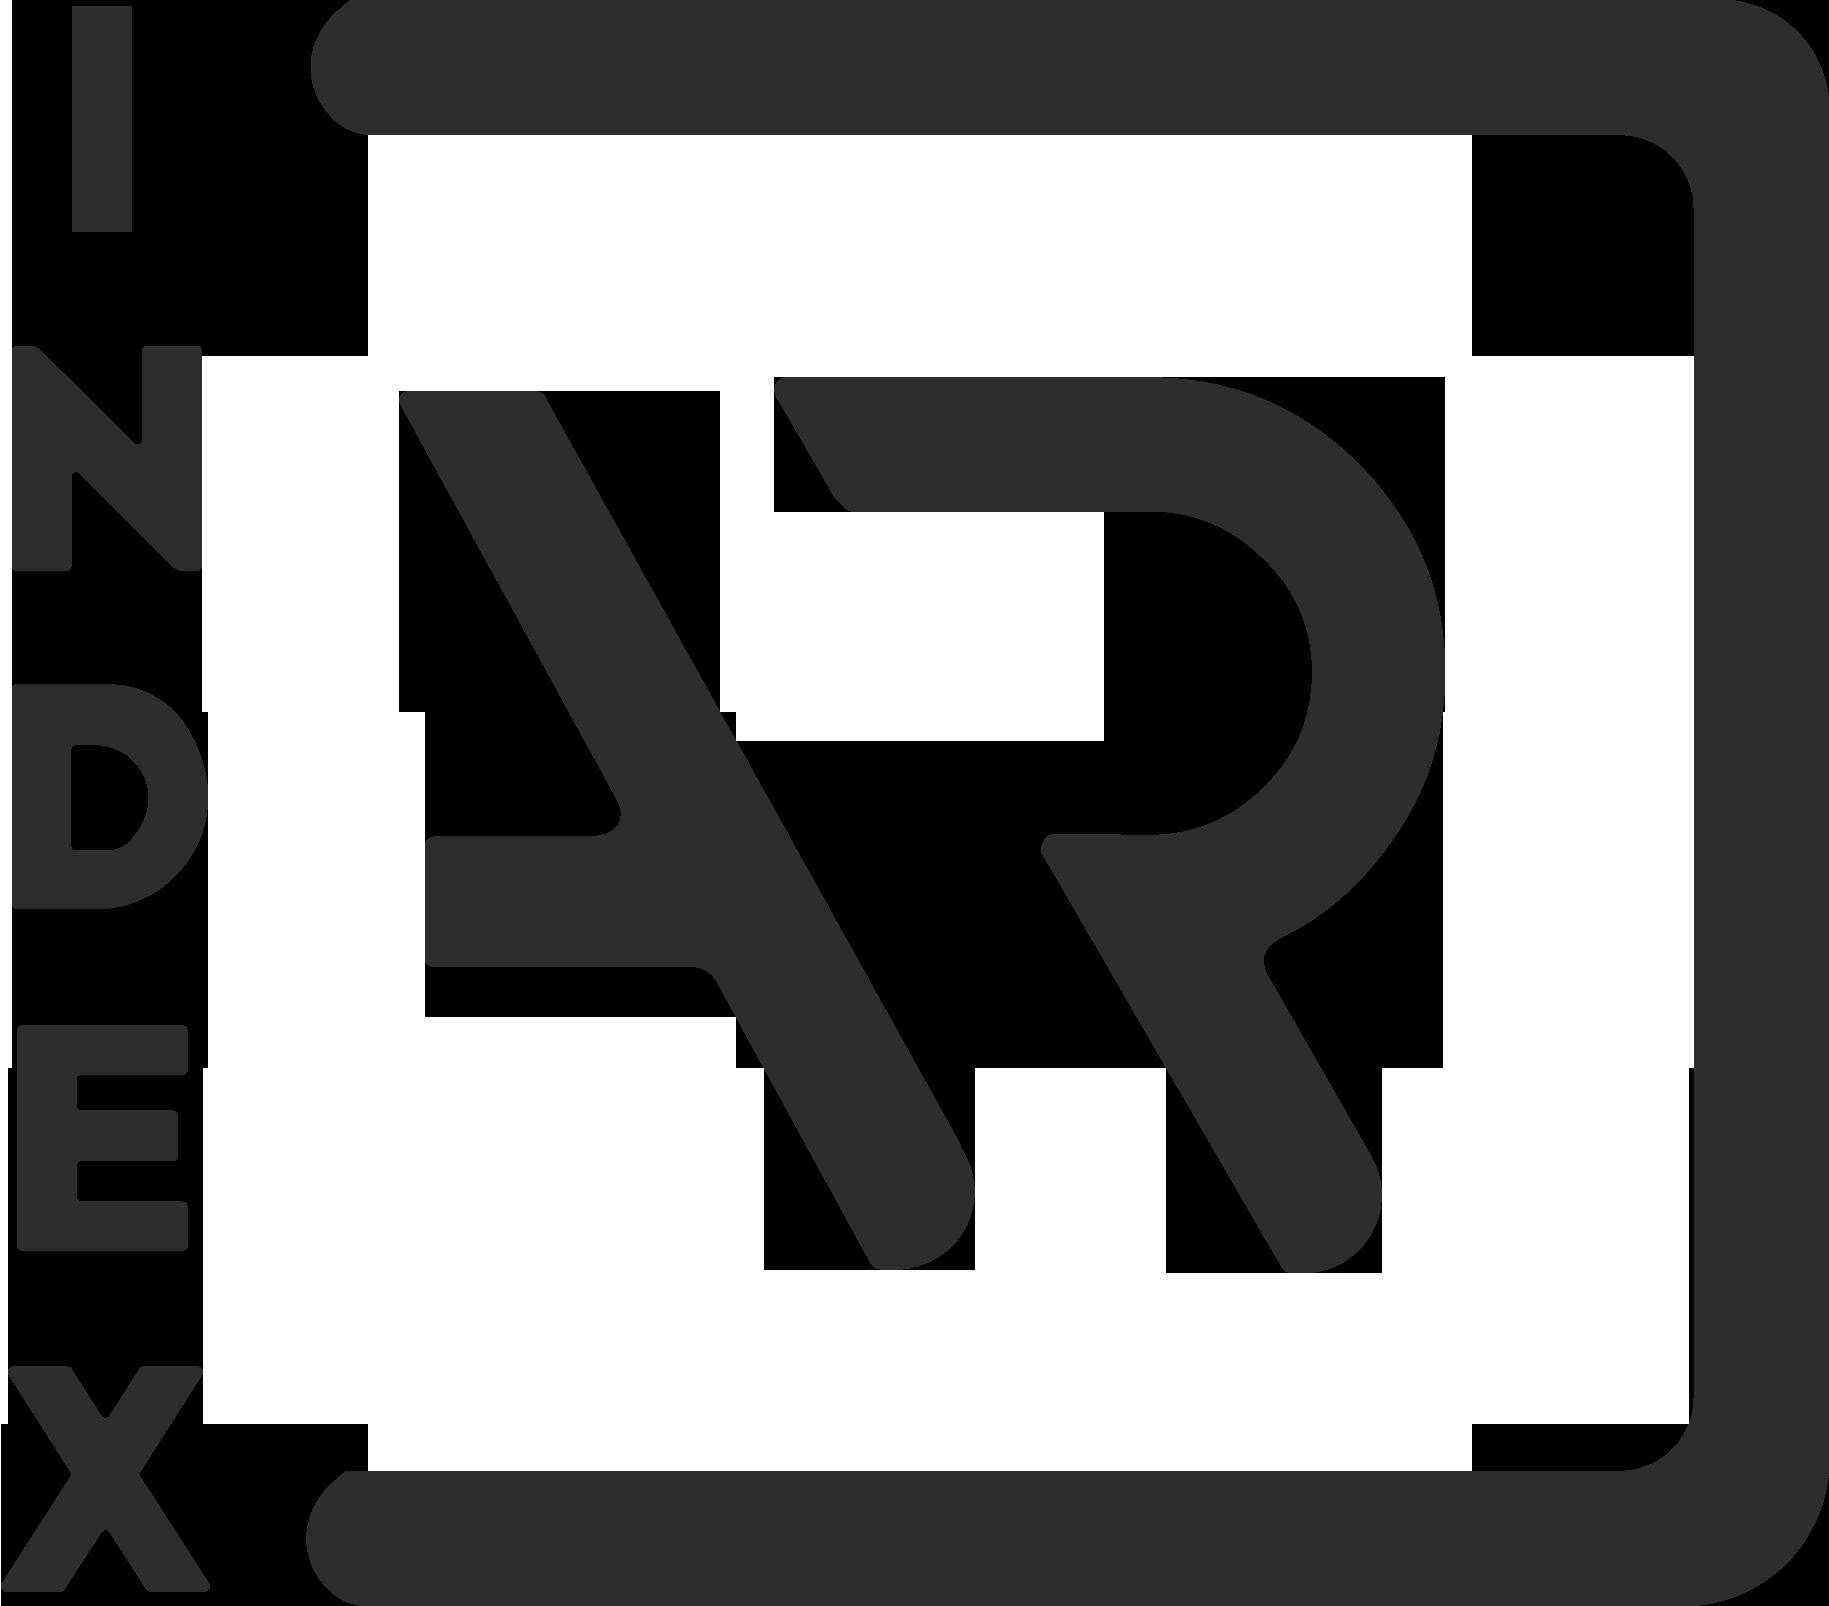 indexAR-logo (1).png